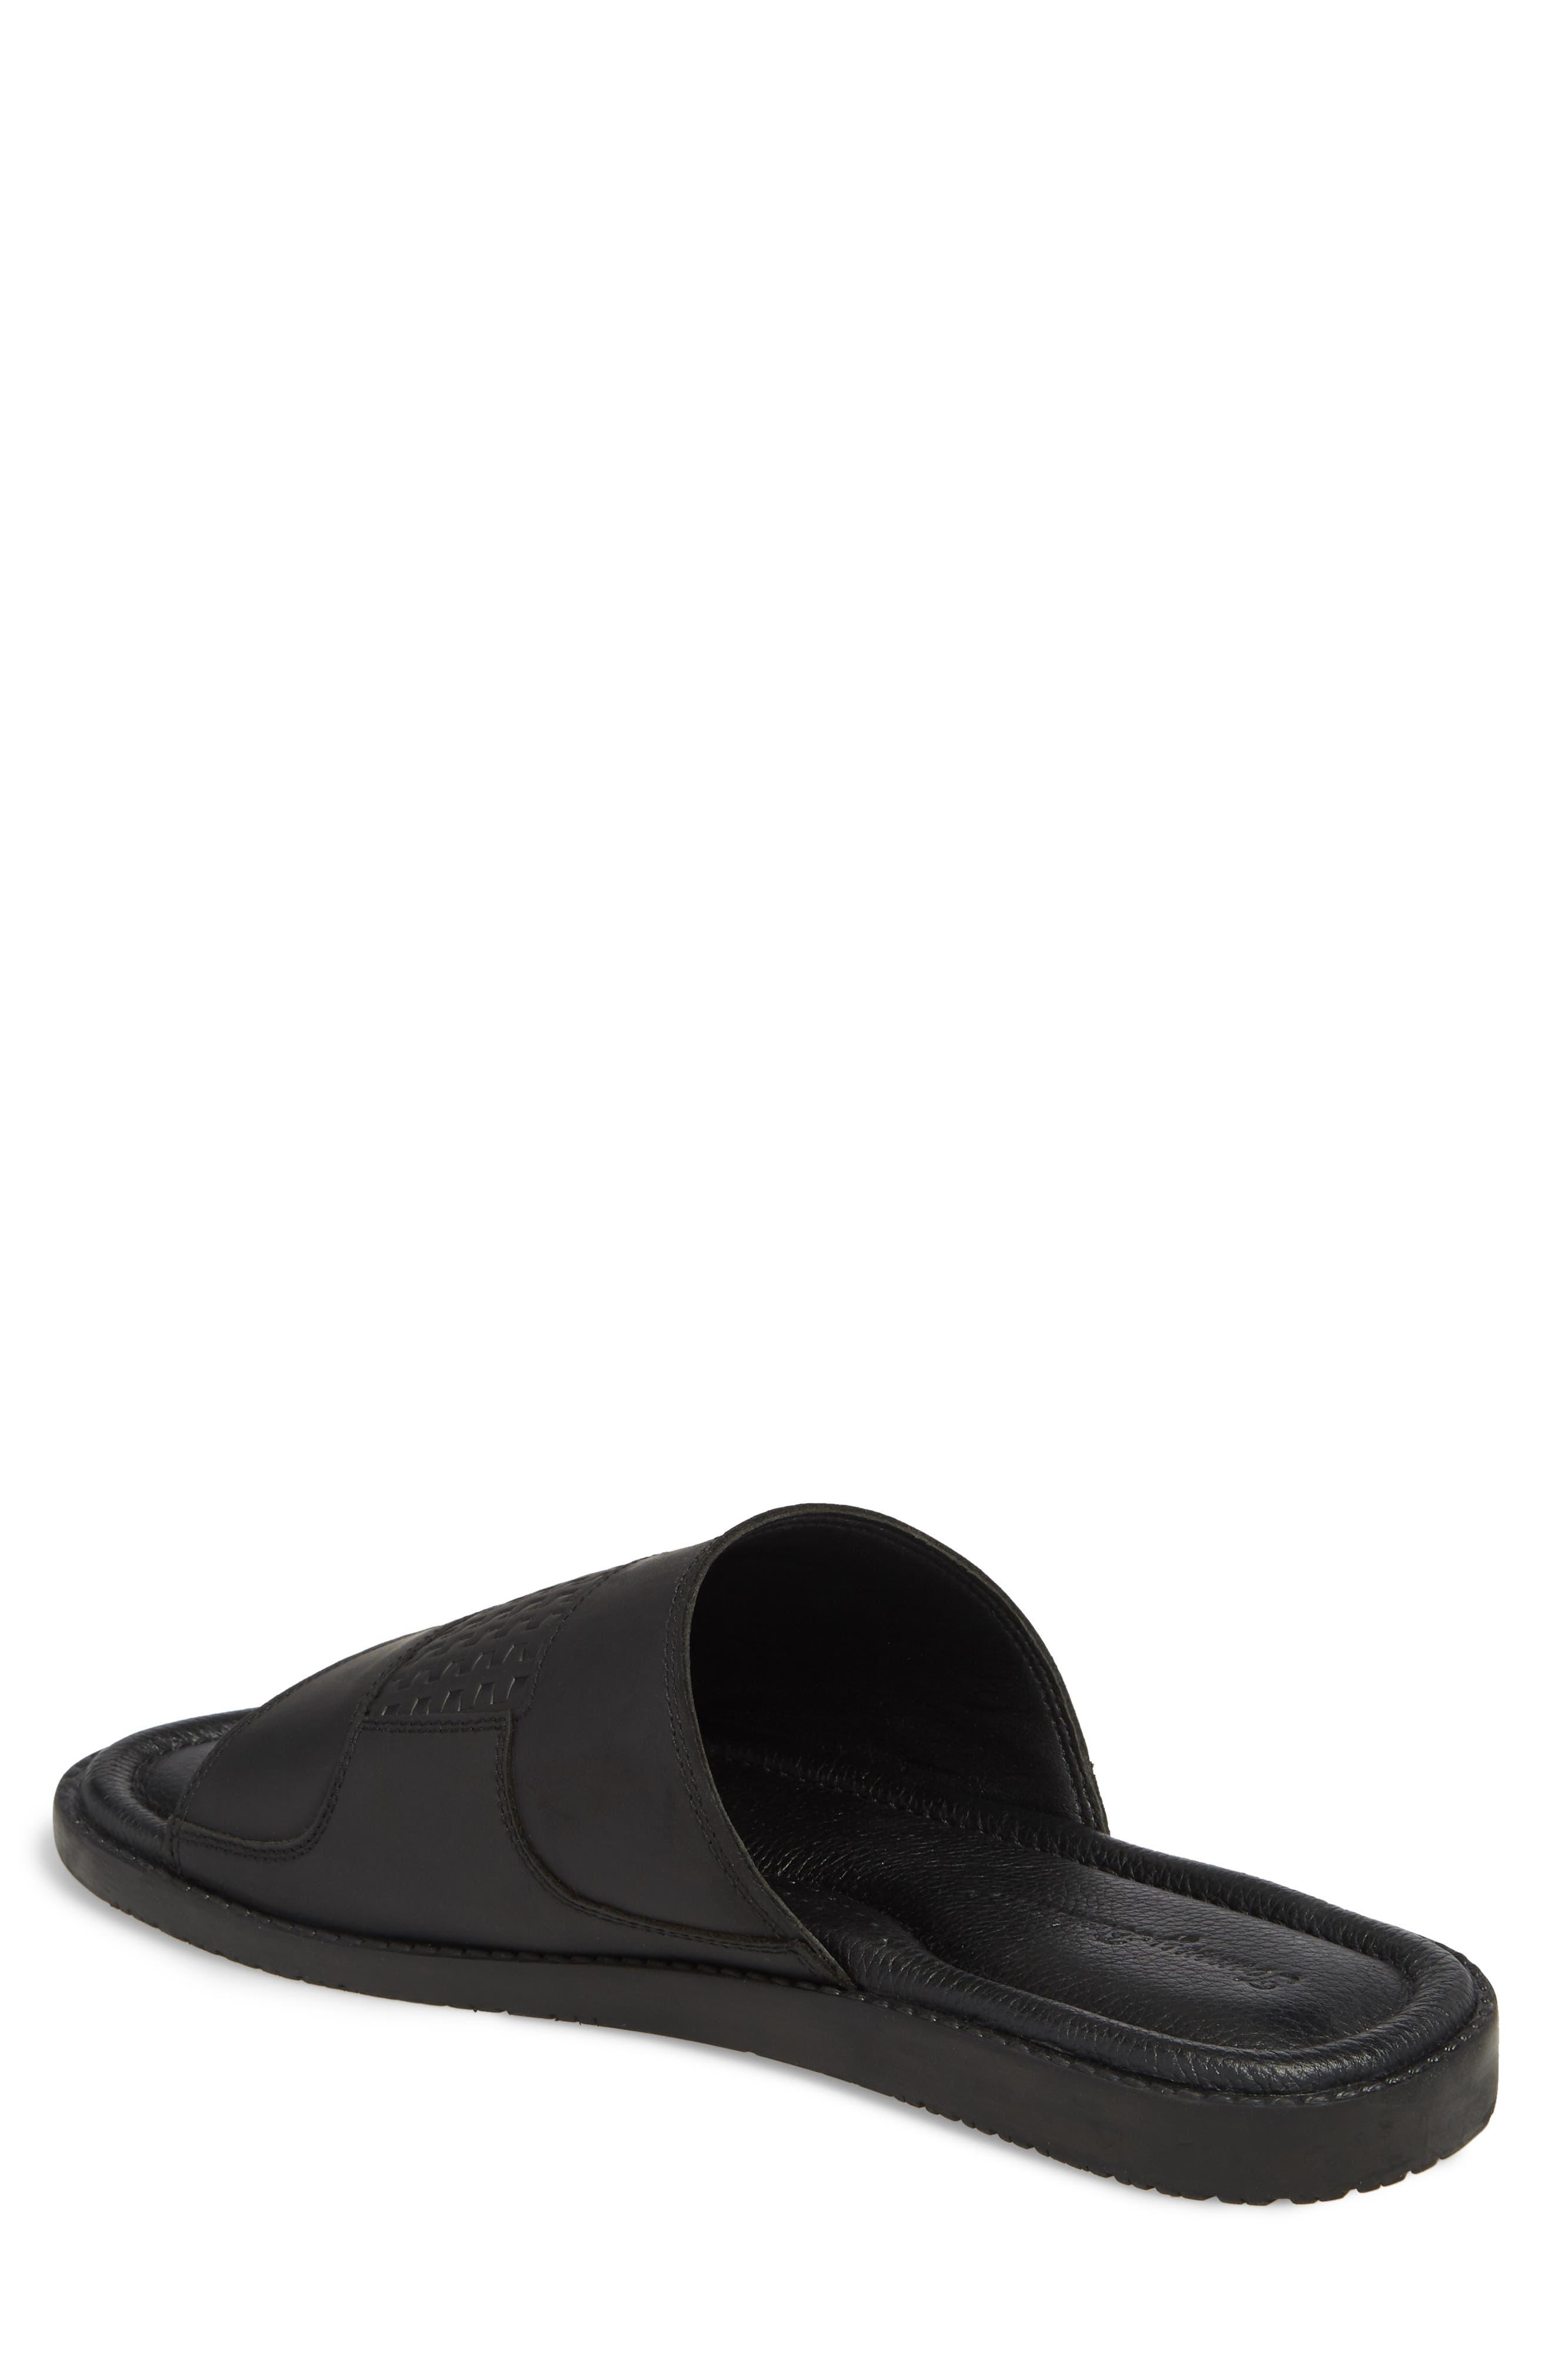 Gennadi Palms Slide Sandal,                             Alternate thumbnail 2, color,                             BLACK LEATHER